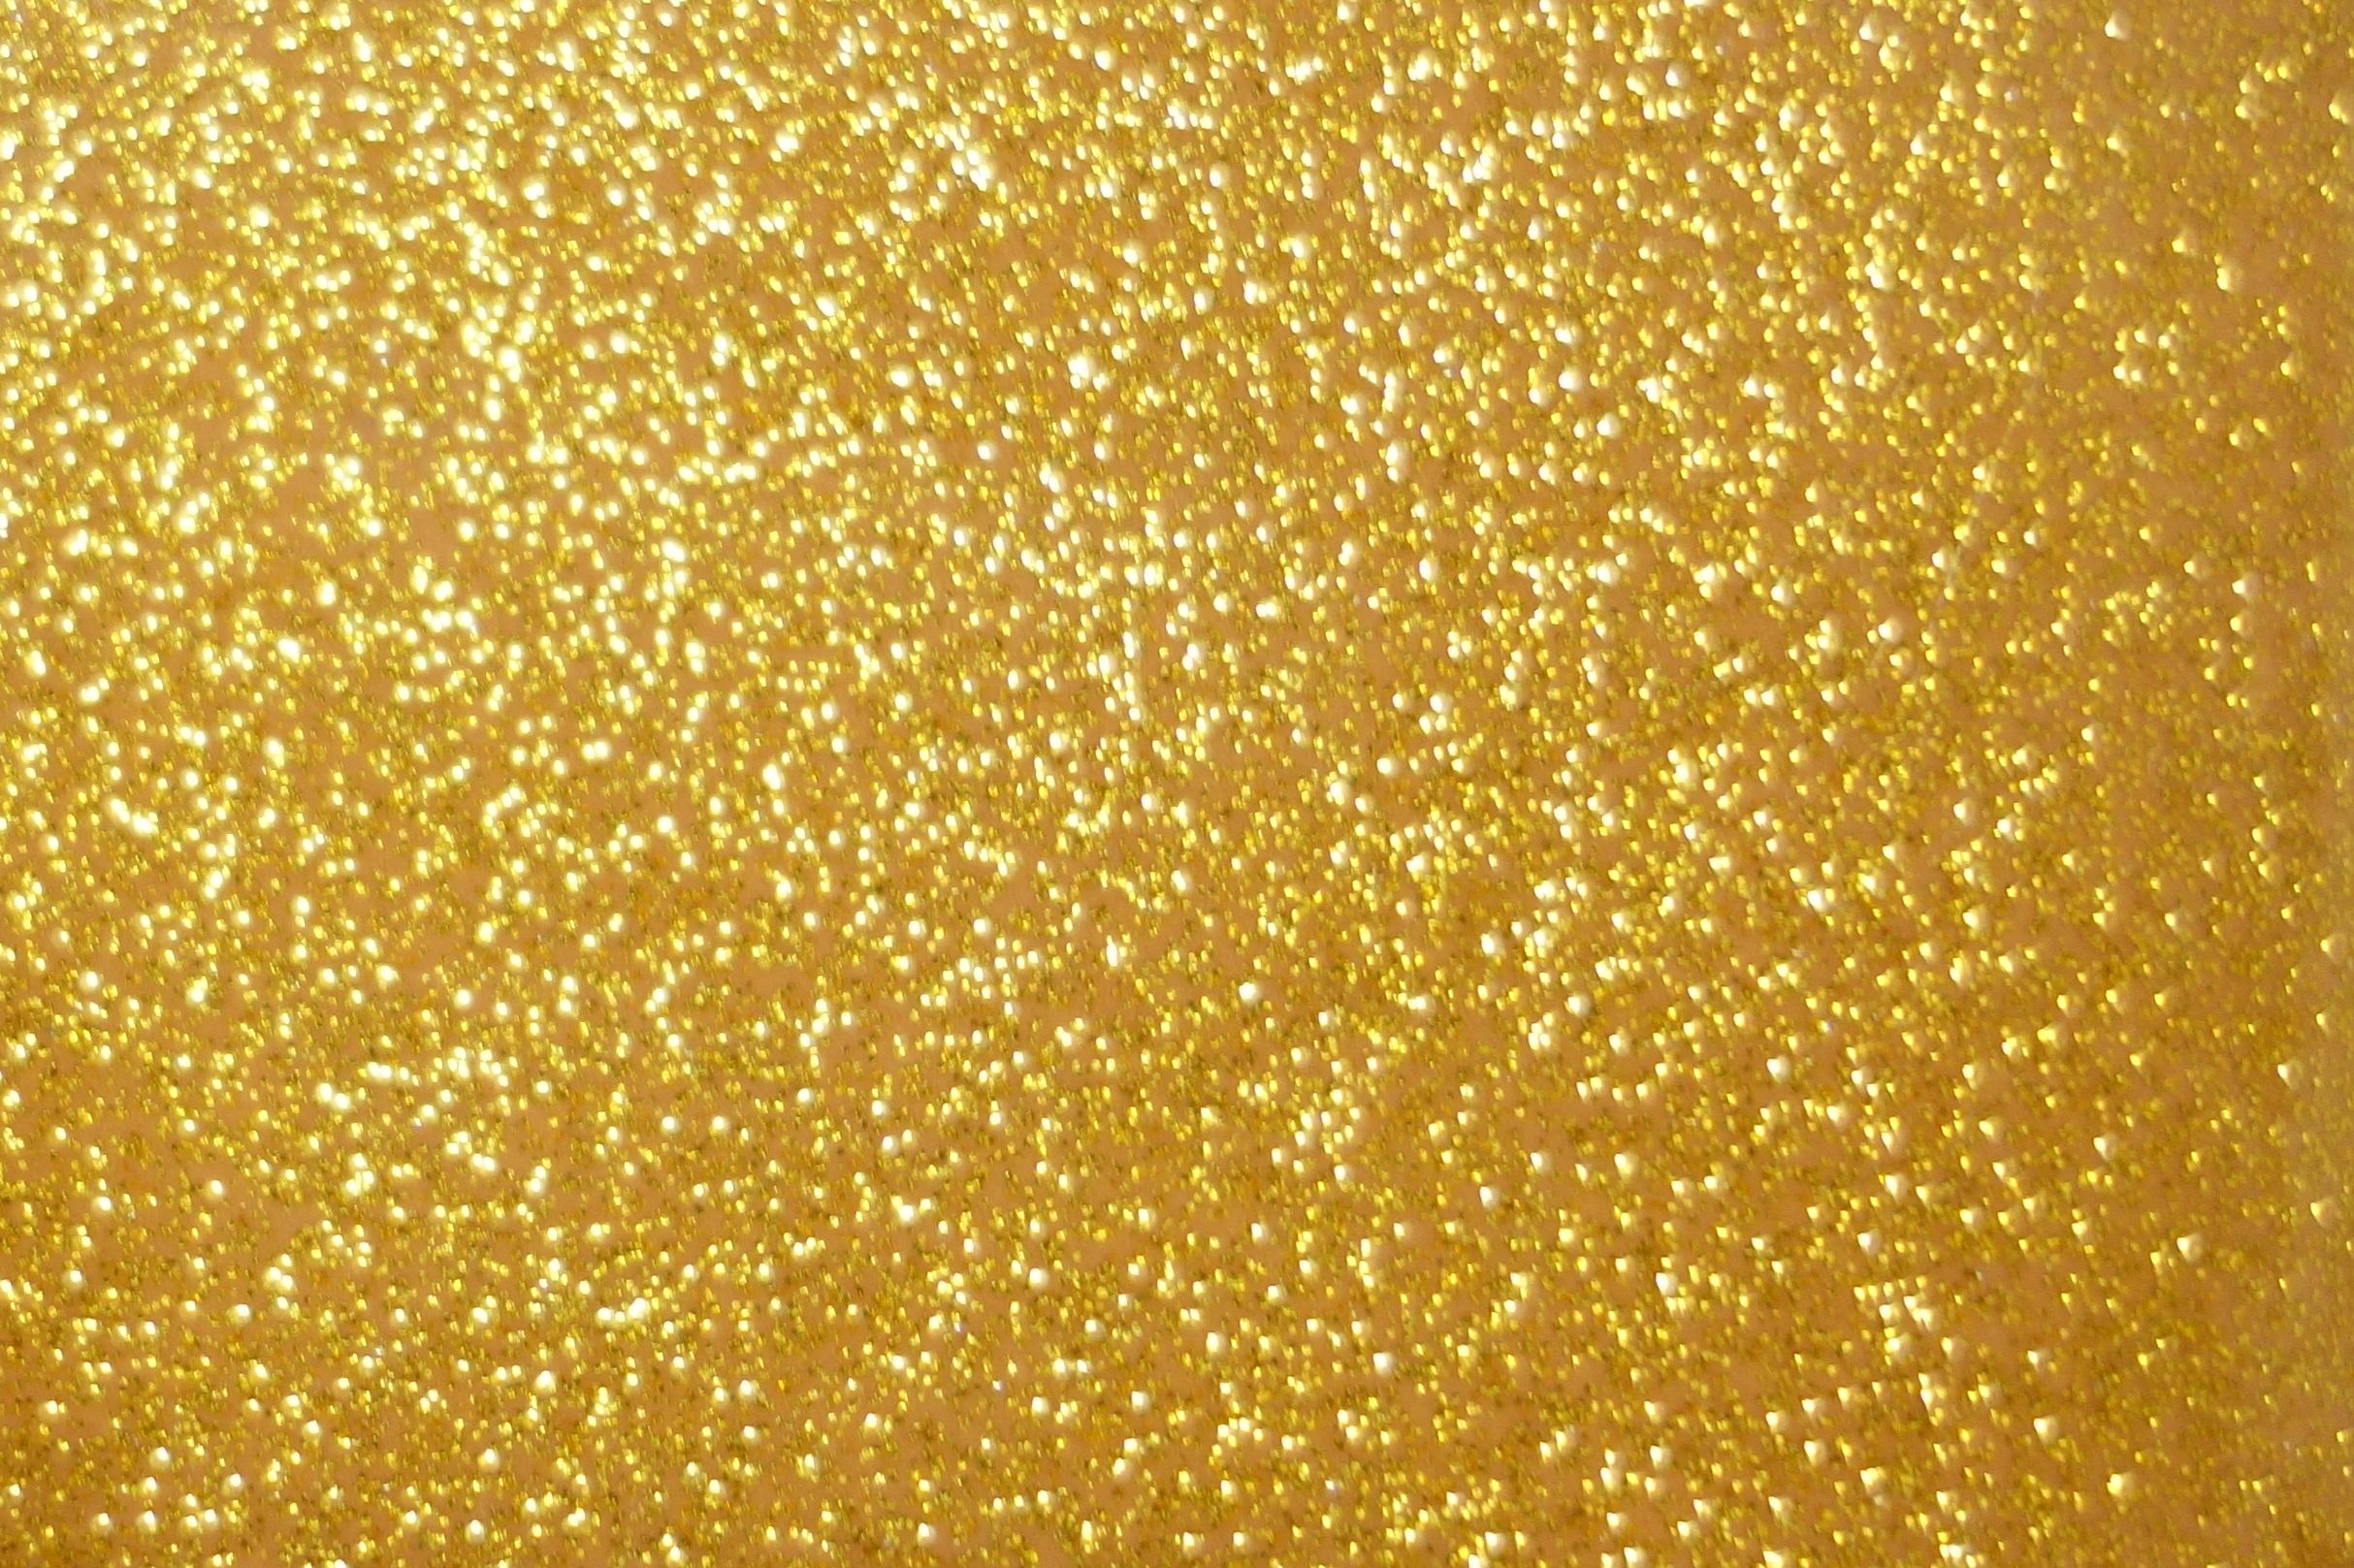 Mendels :: Vinyl Fabrics :: Sparkle Vinyl (15 colors)